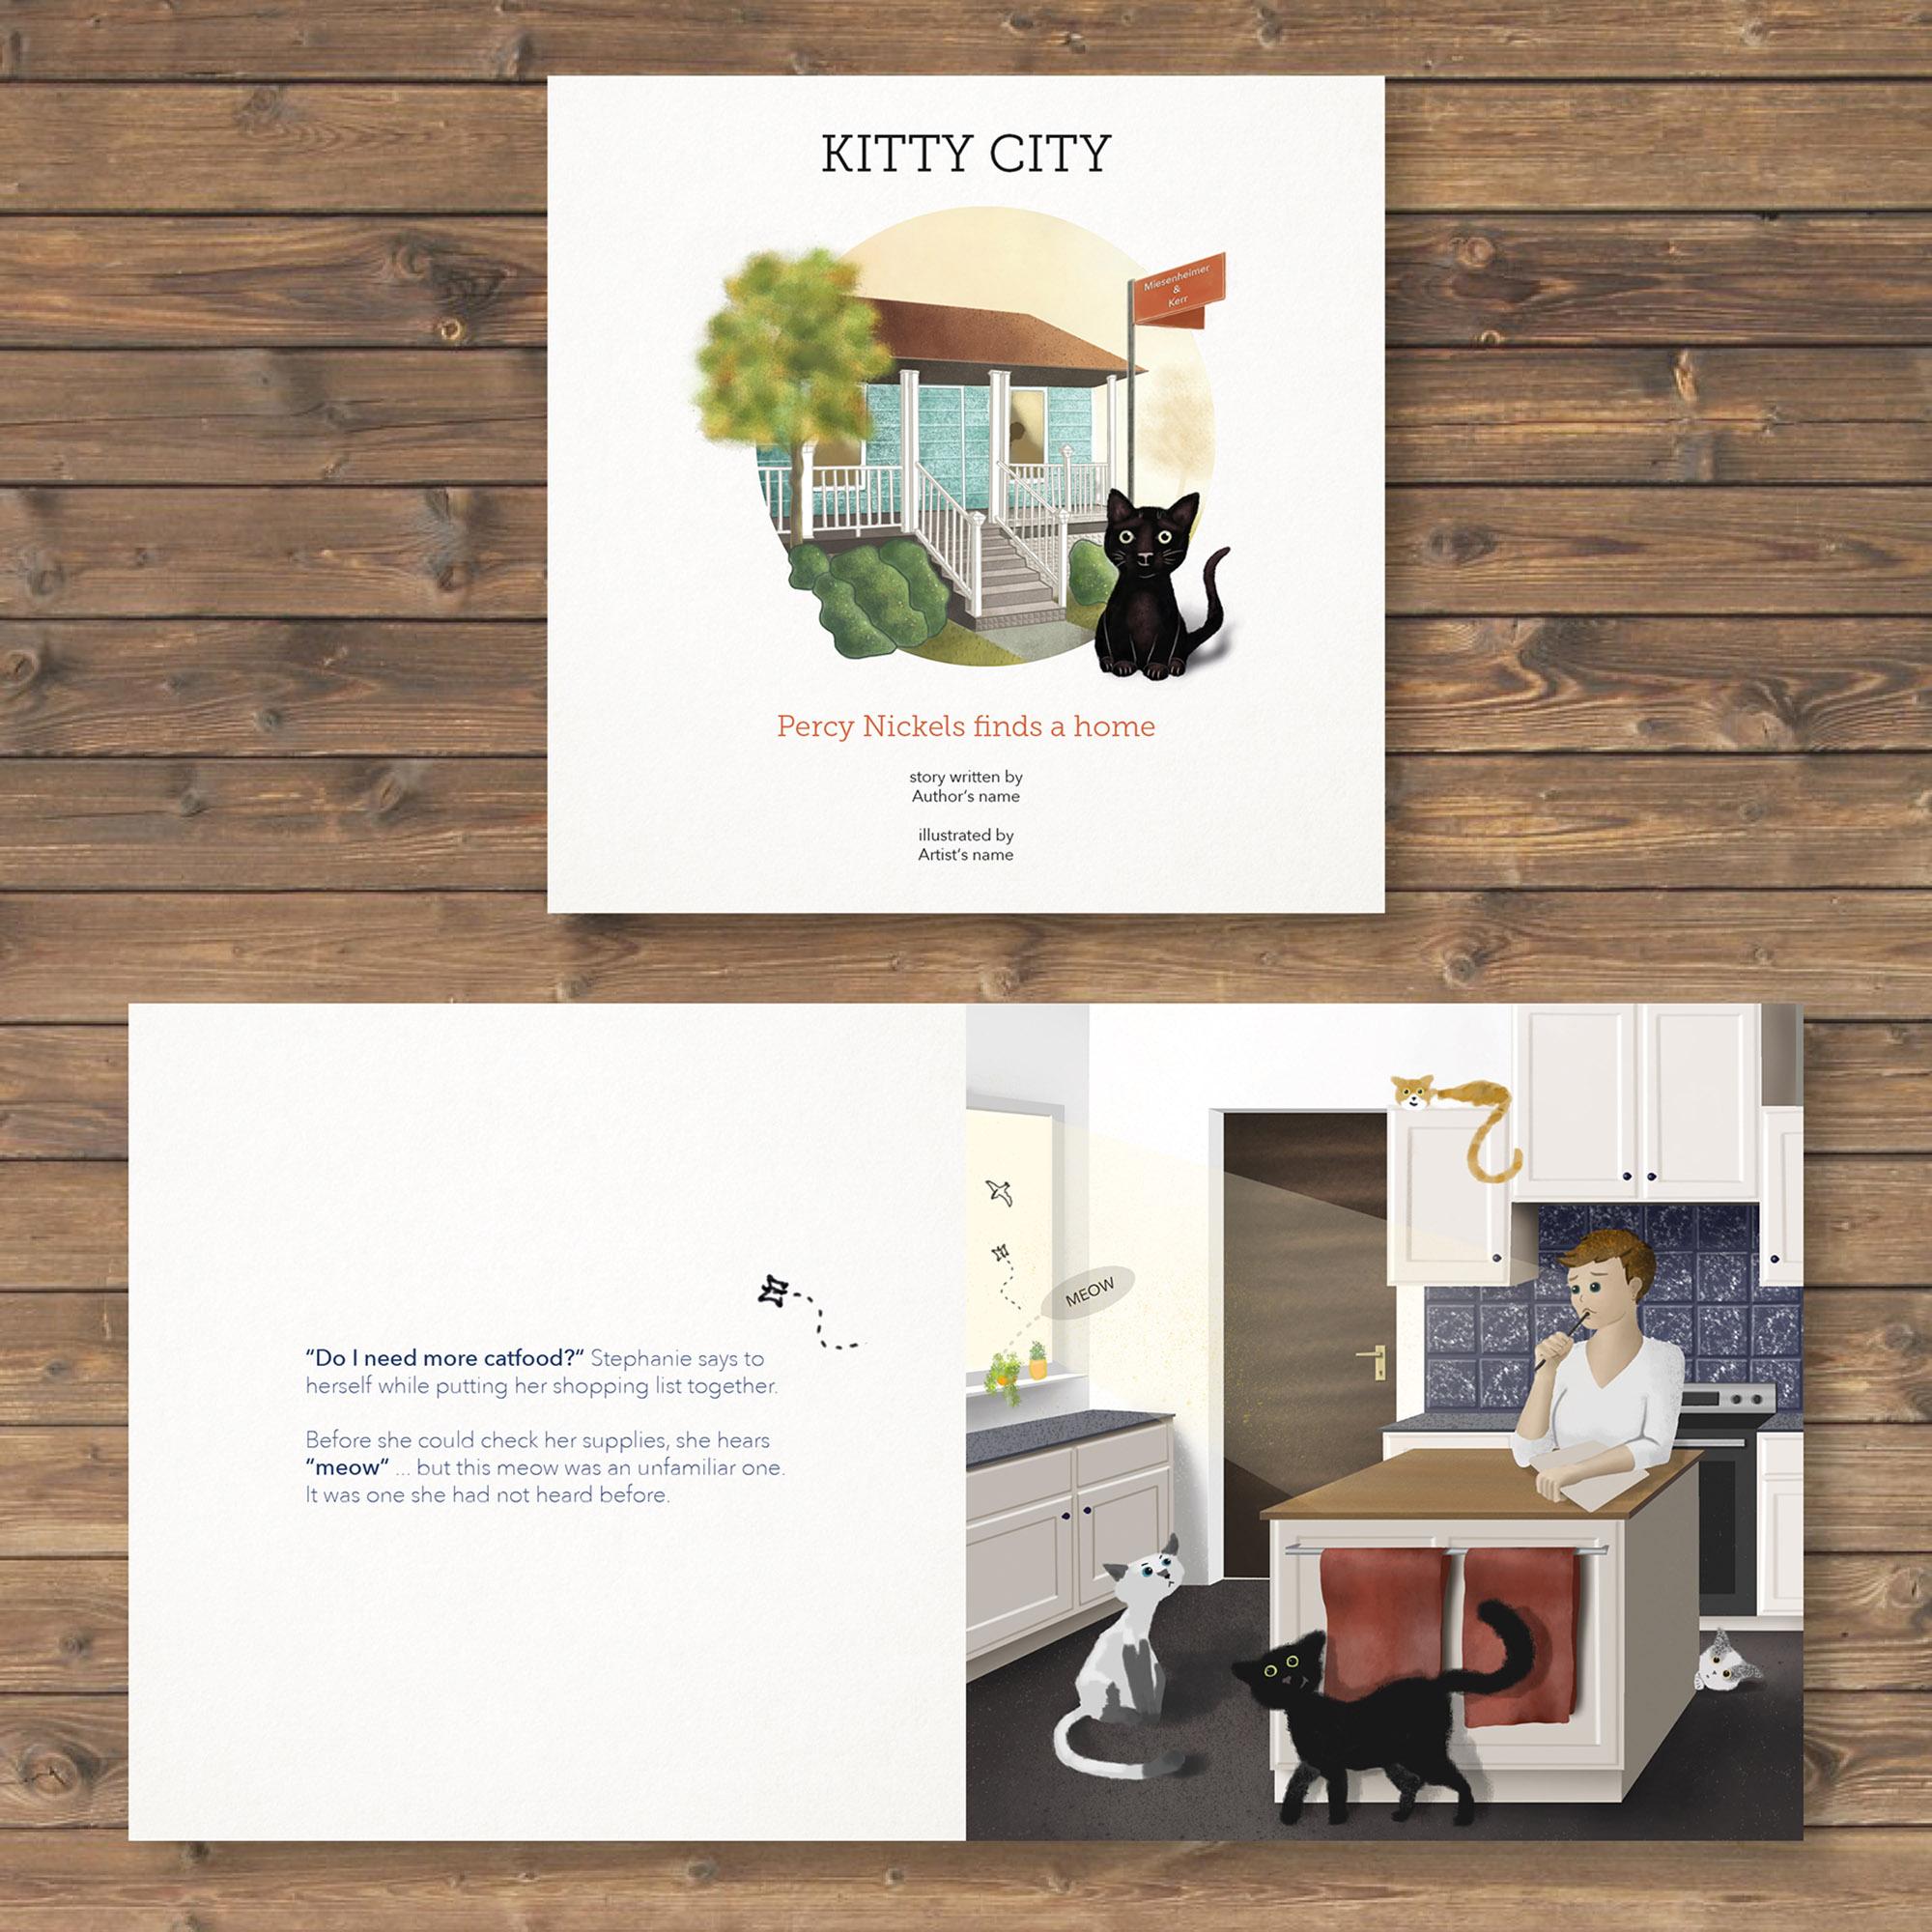 kitty_city_1